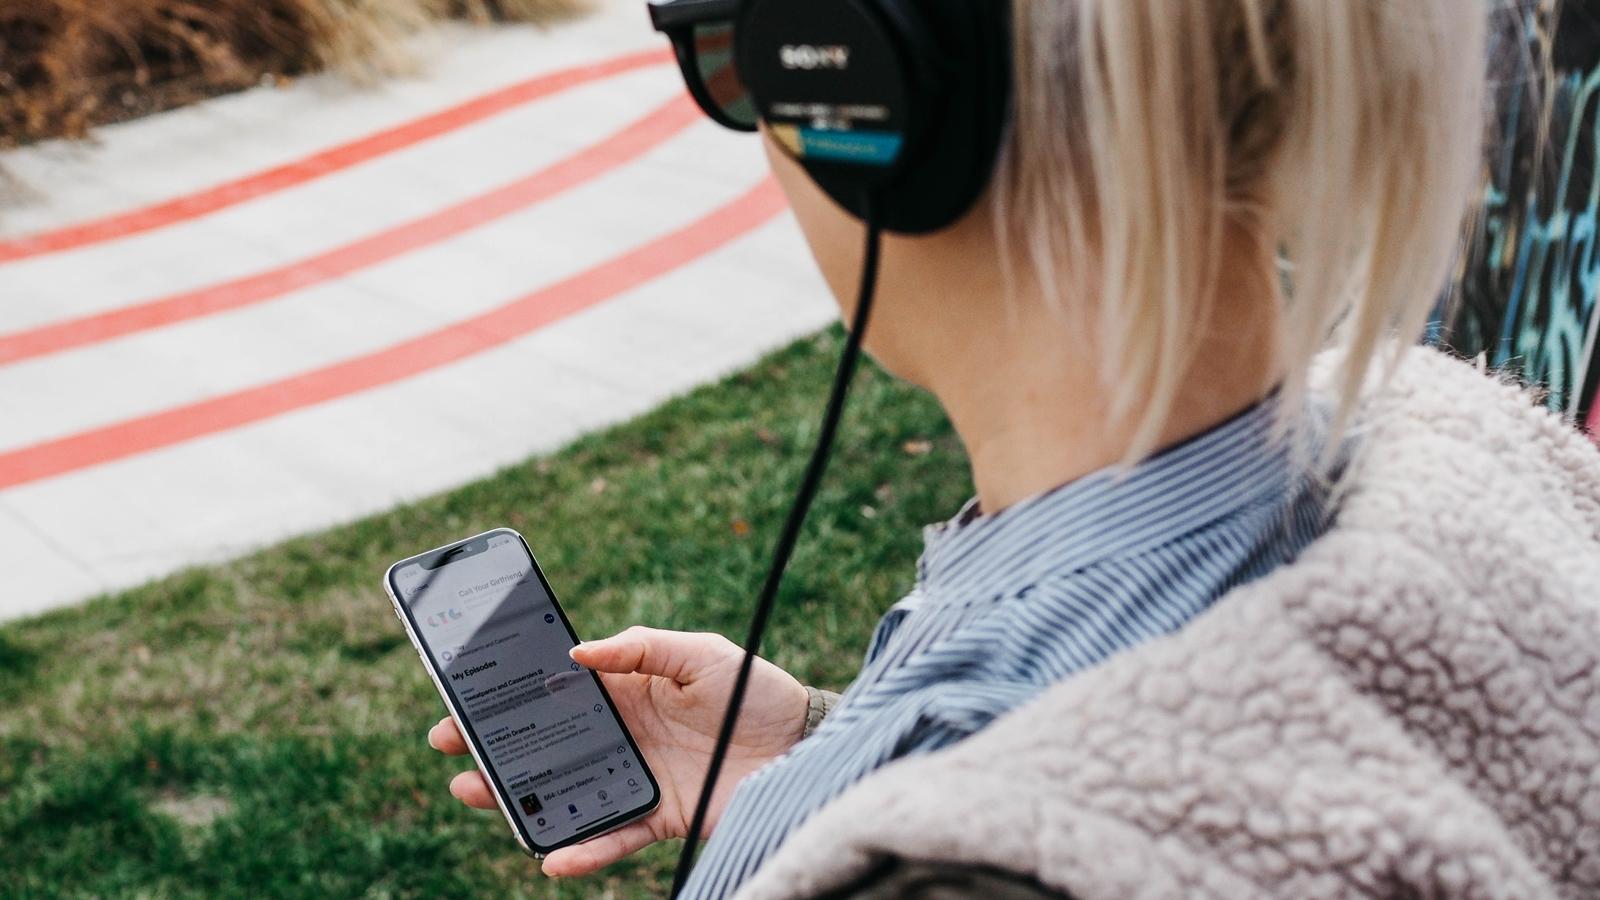 Frau nutzt Apple Music auf iPhone